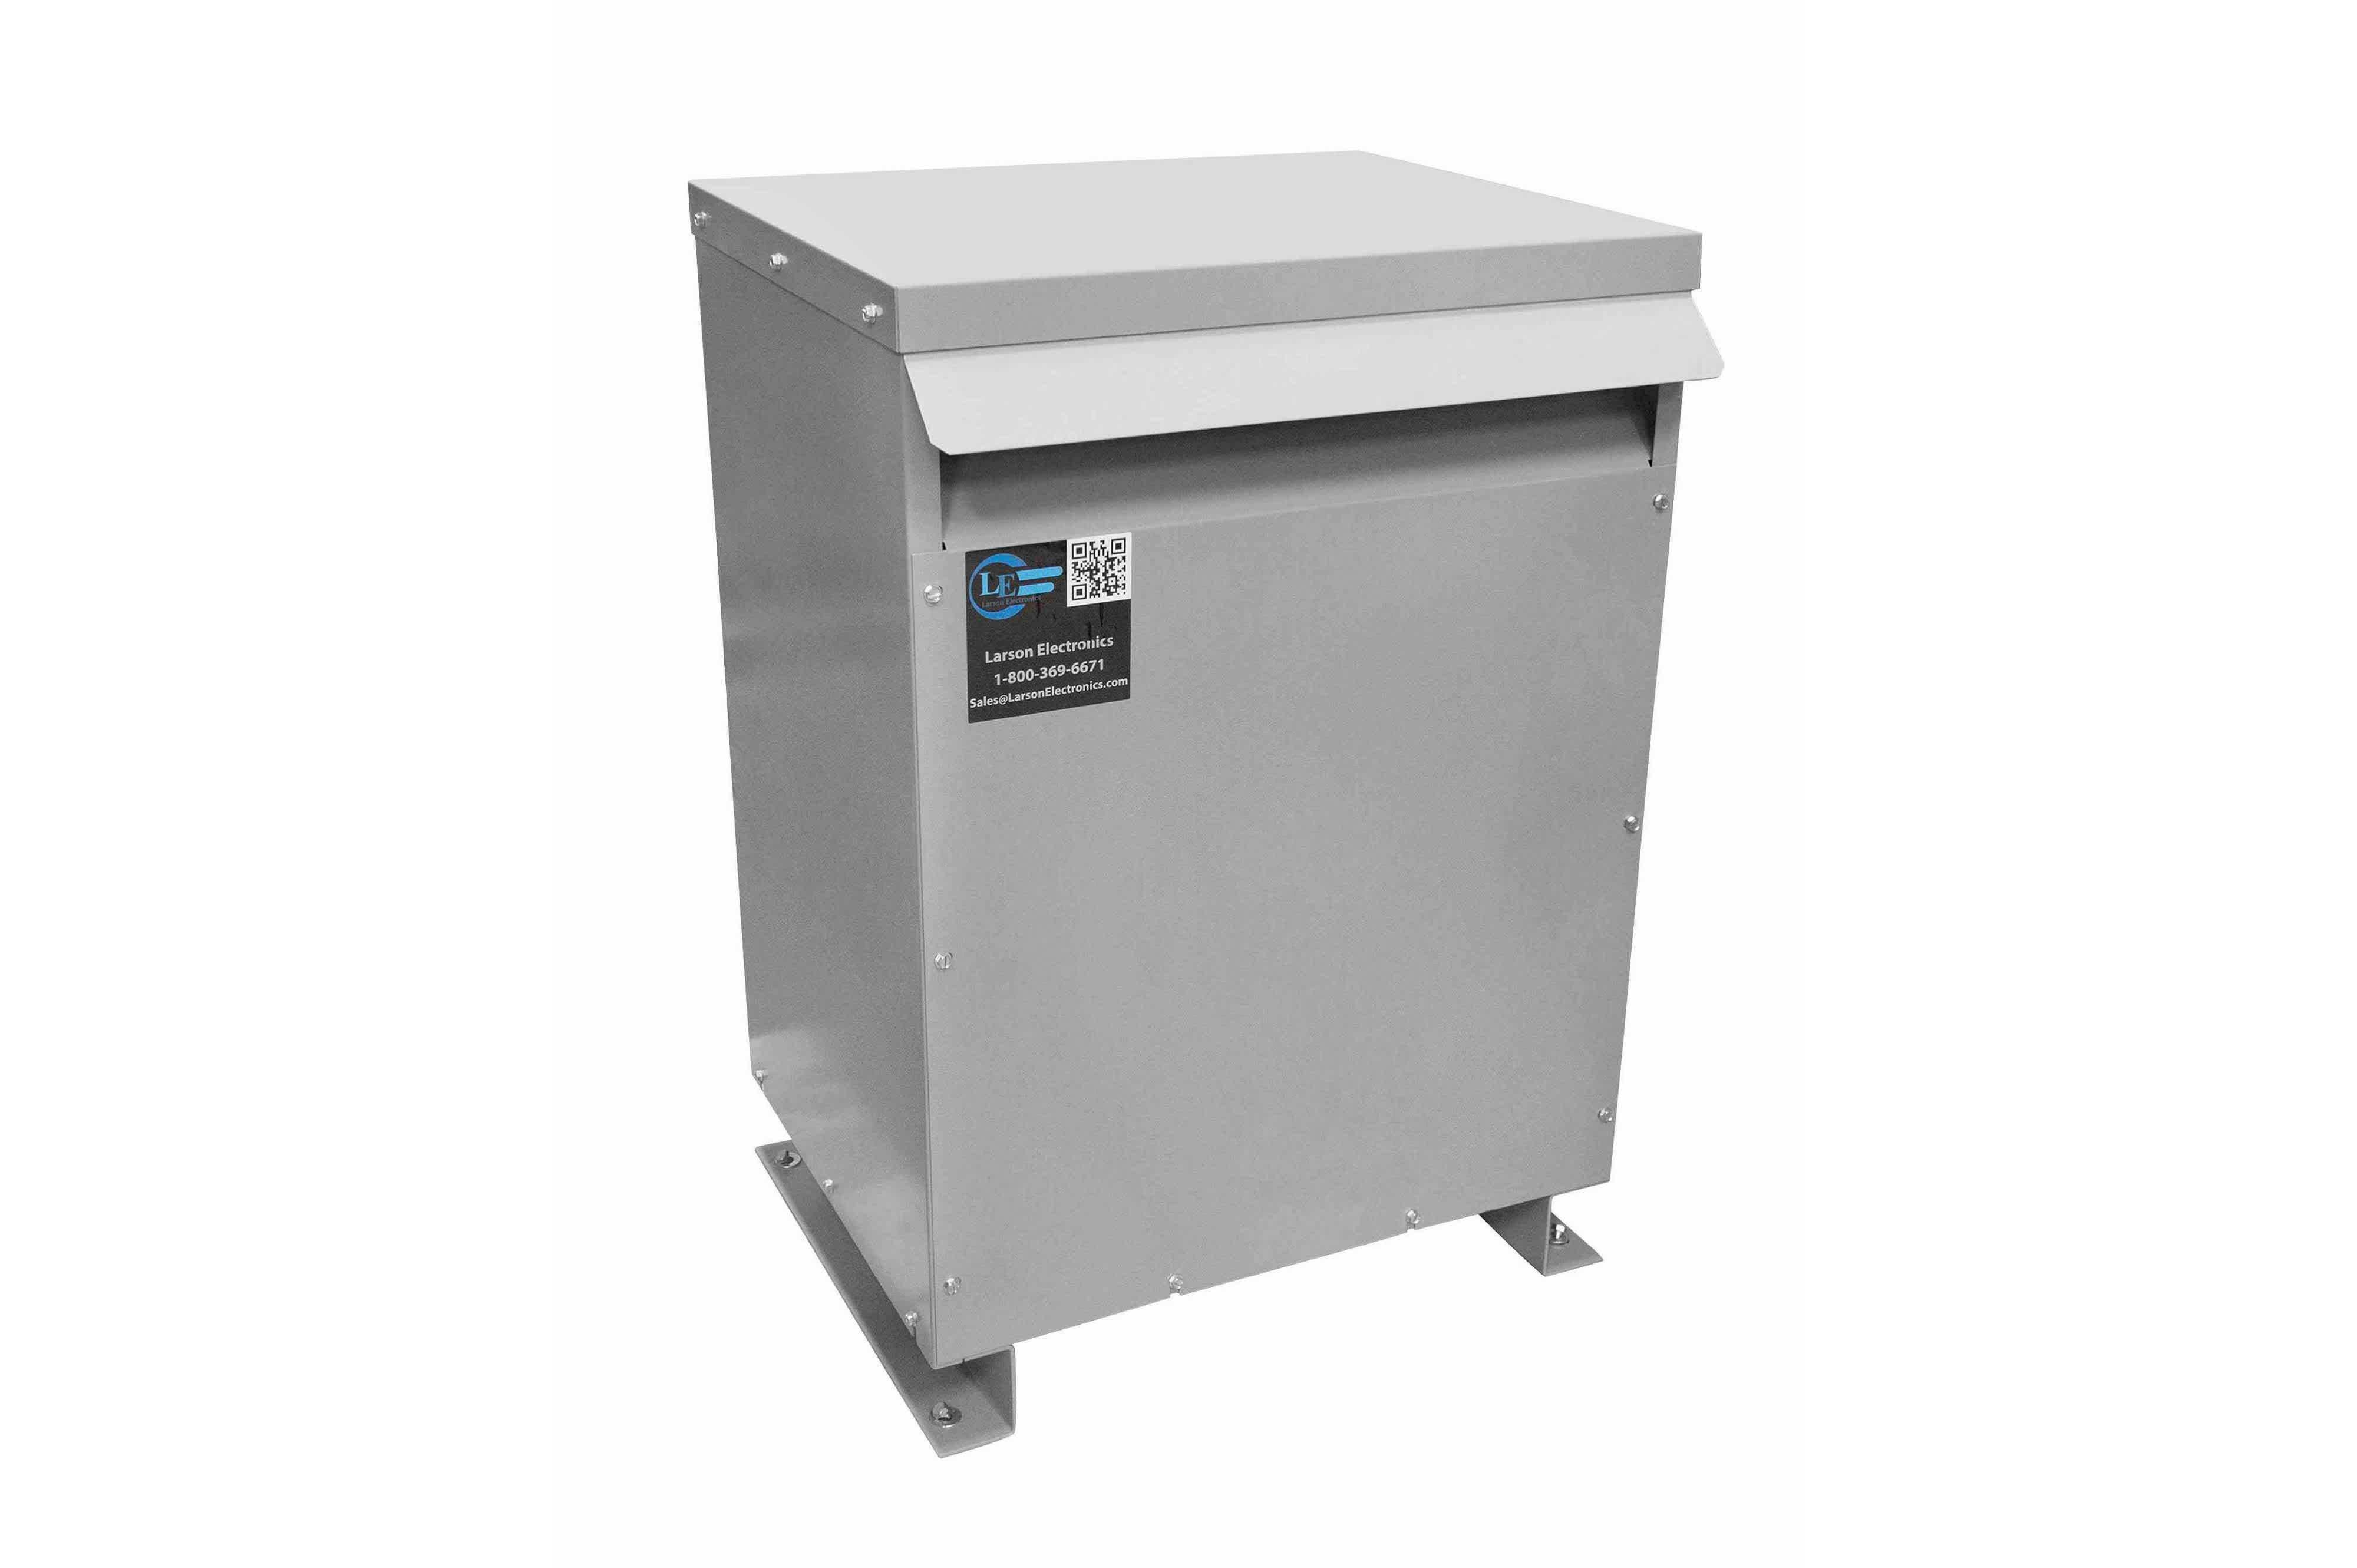 200 kVA 3PH Isolation Transformer, 460V Wye Primary, 380Y/220 Wye-N Secondary, N3R, Ventilated, 60 Hz